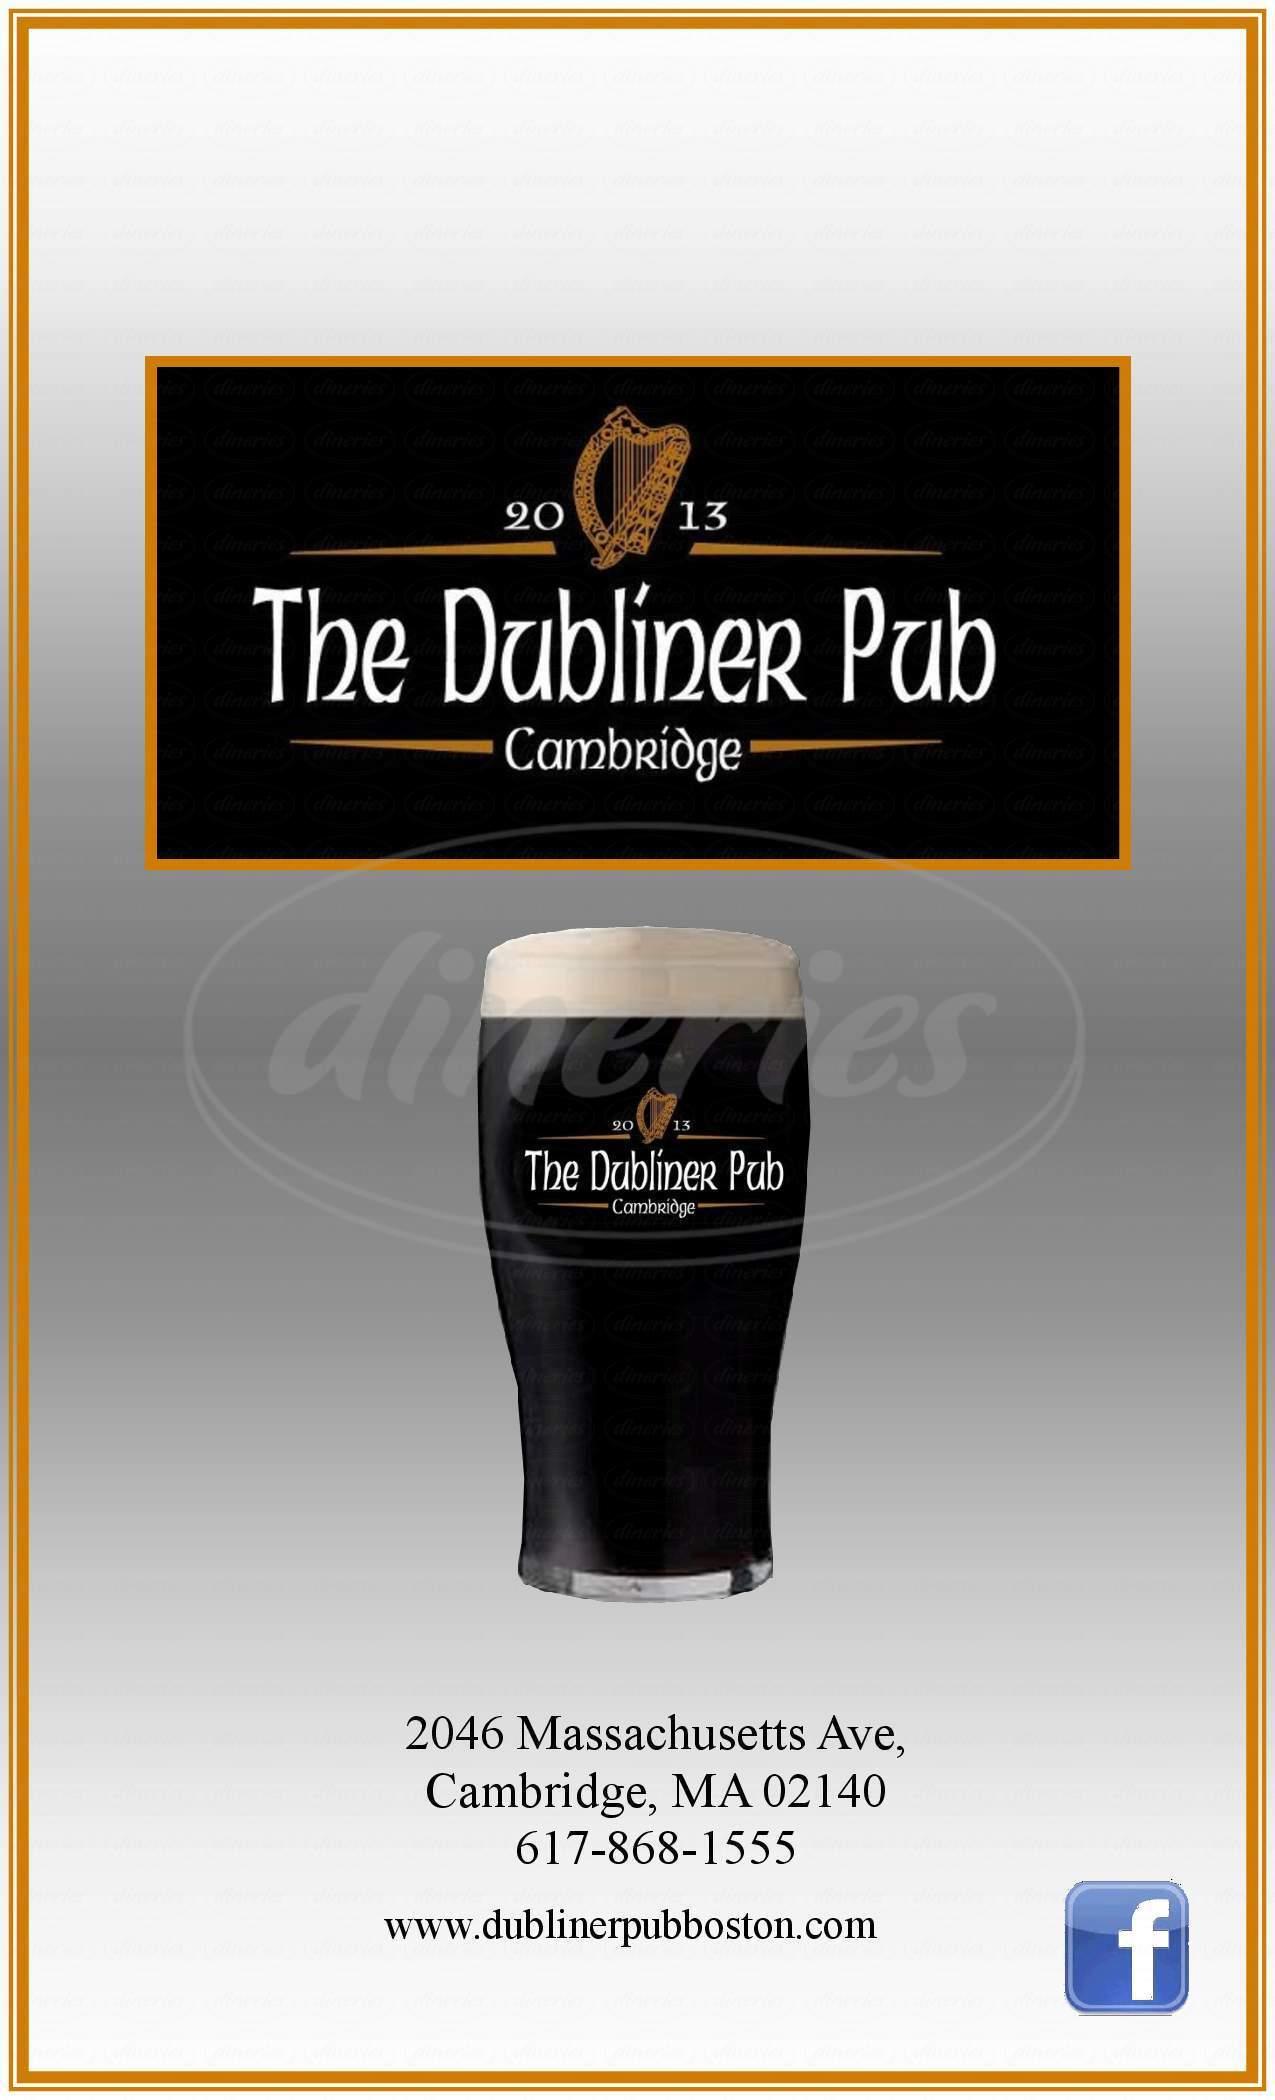 menu for The Dubliner Pub